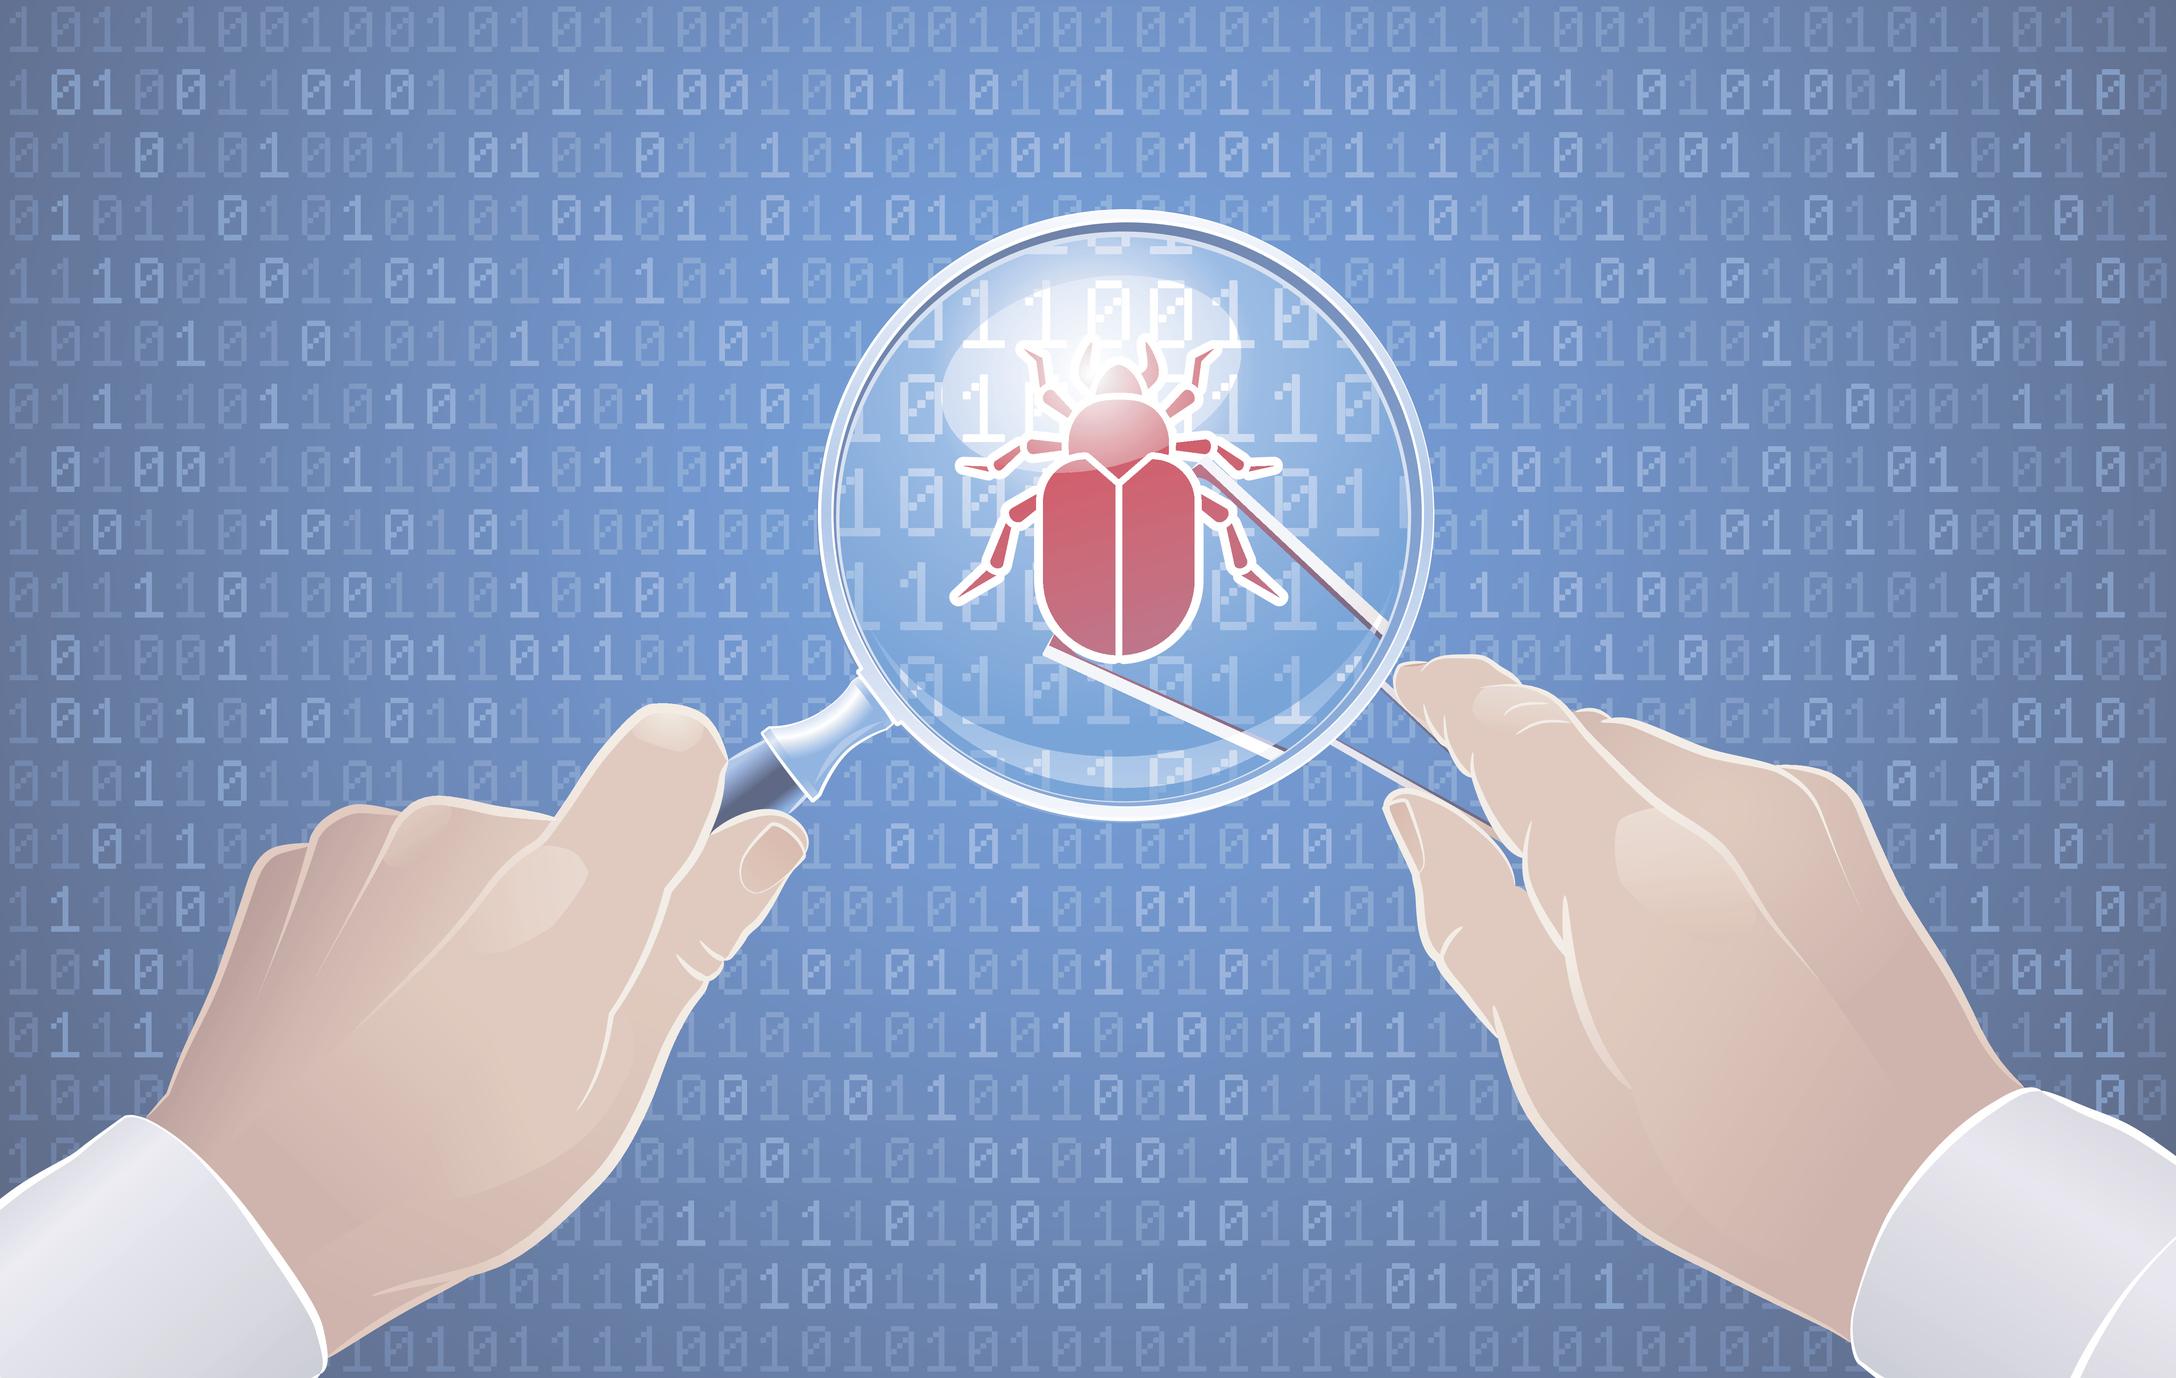 Drupal - Security Vulnerability